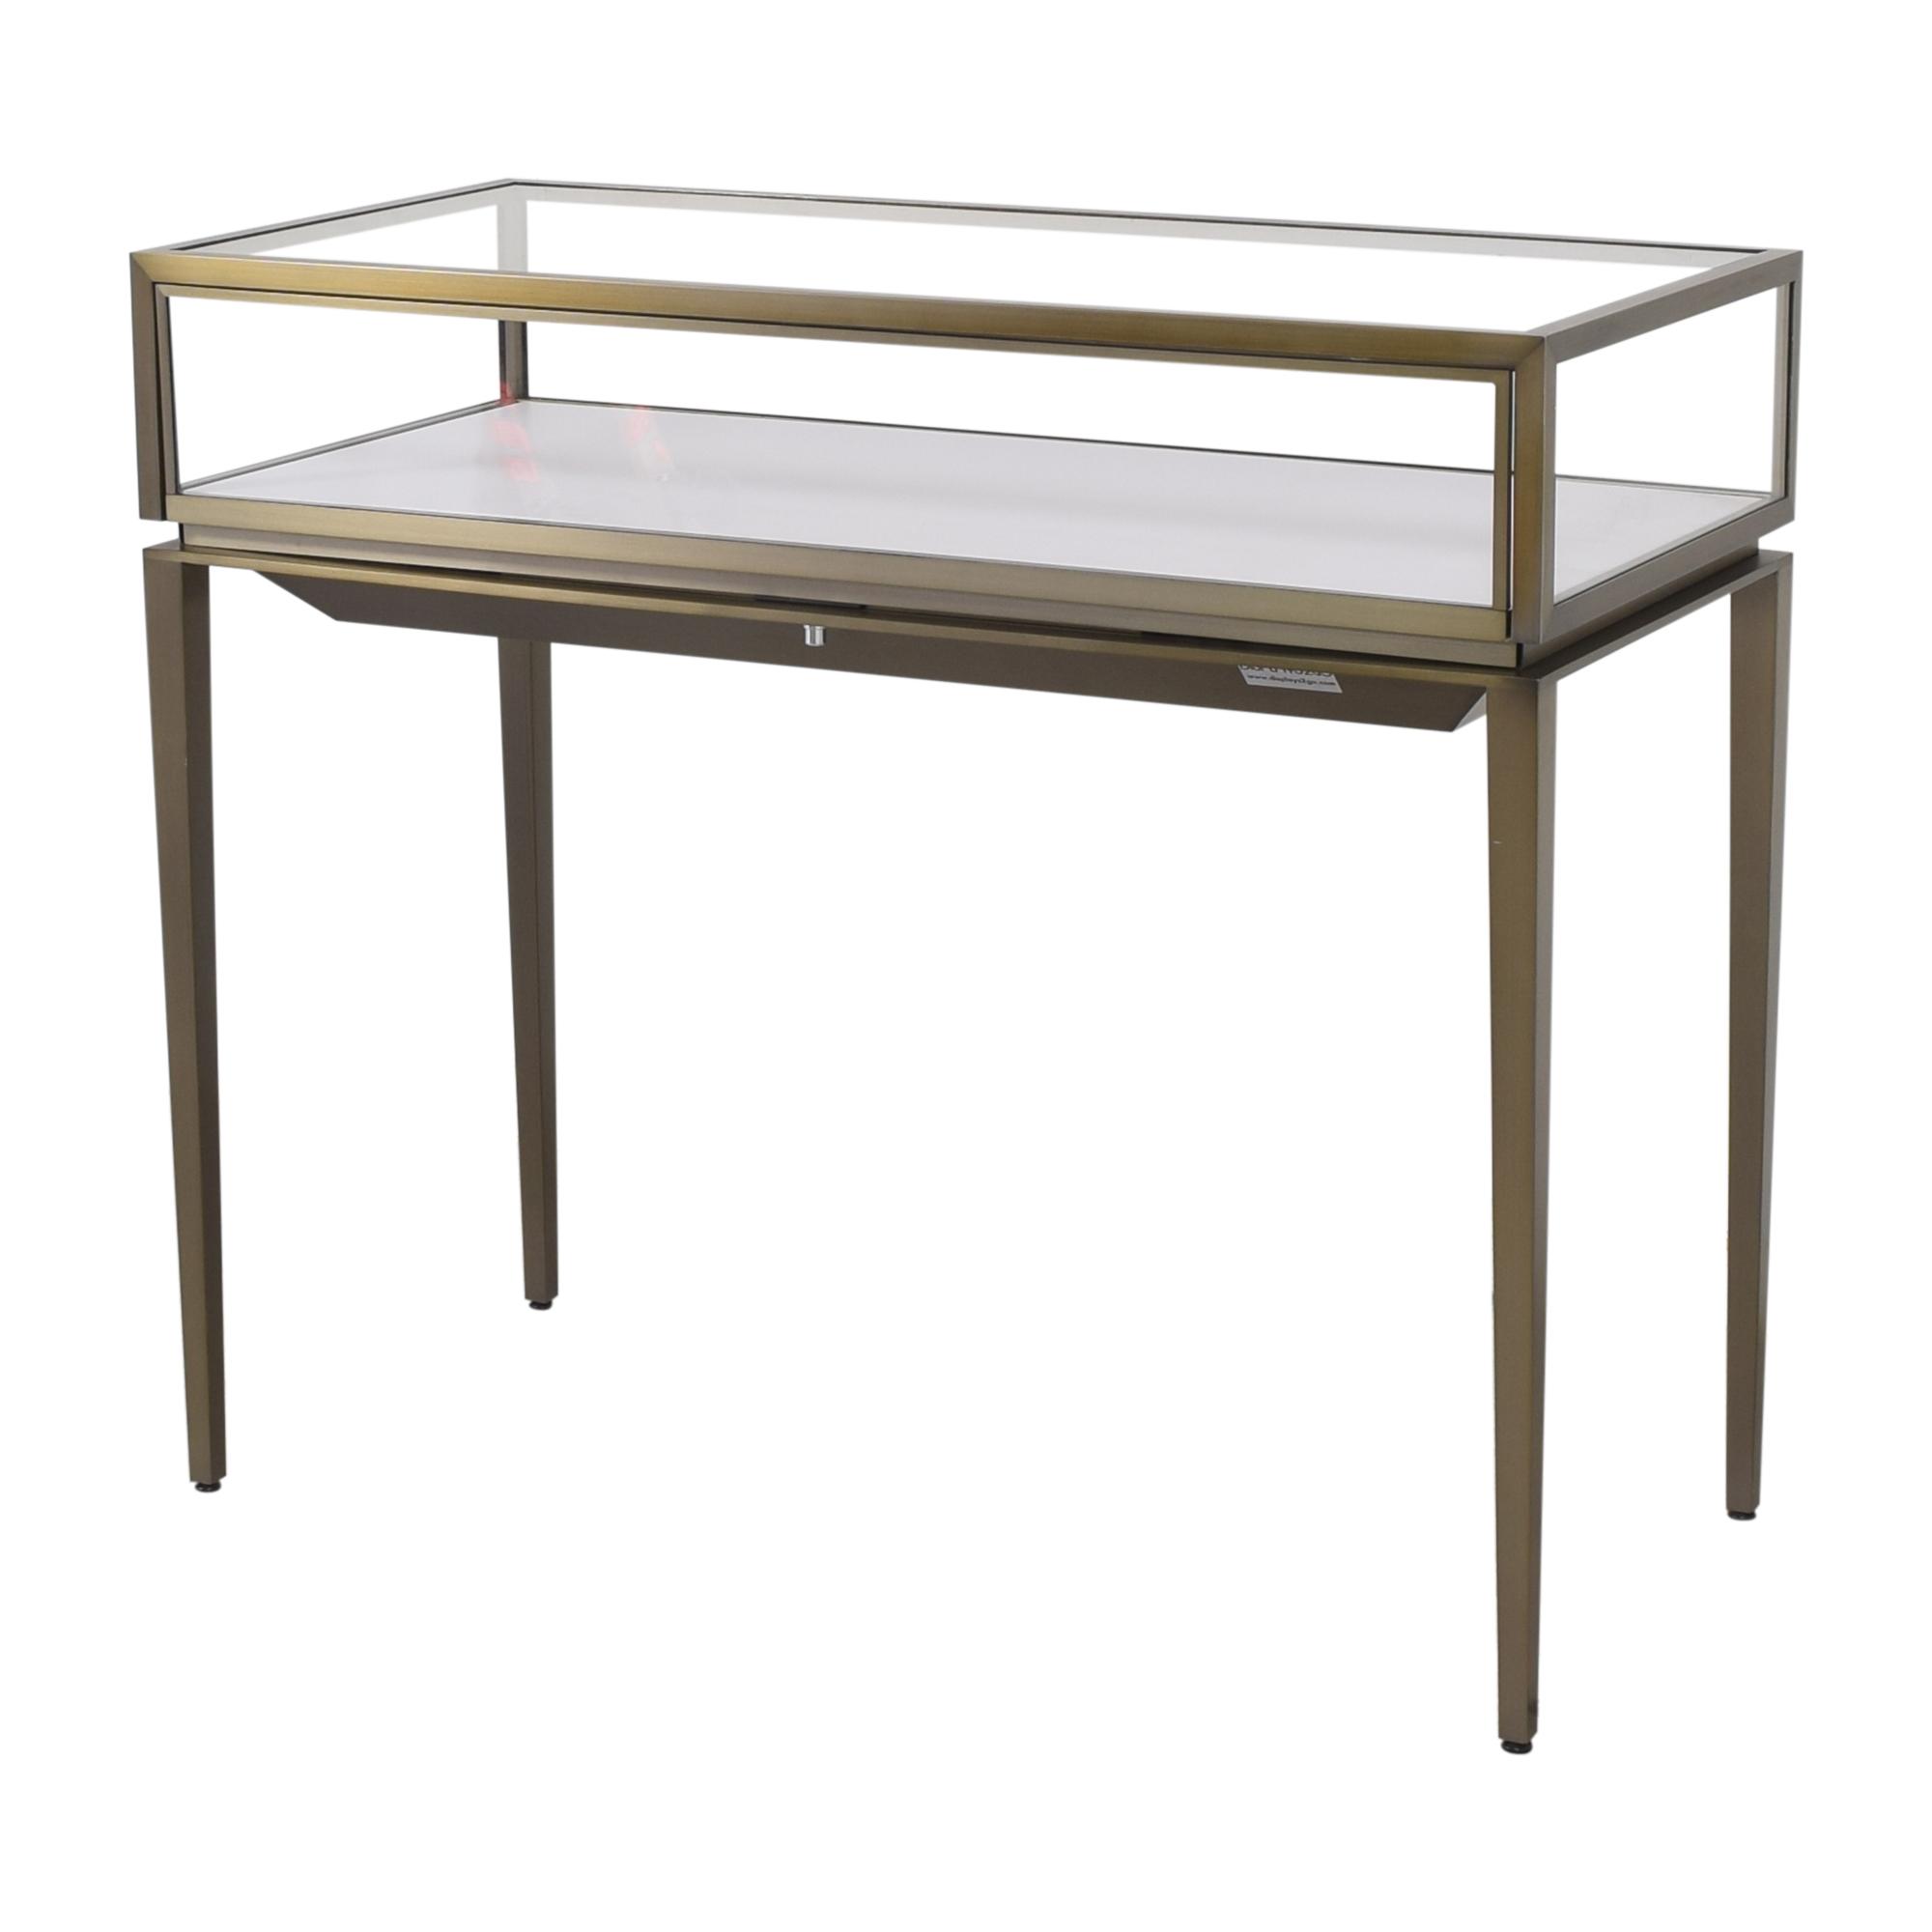 buy Displays2Go Displays2Go Lighted Display Table online